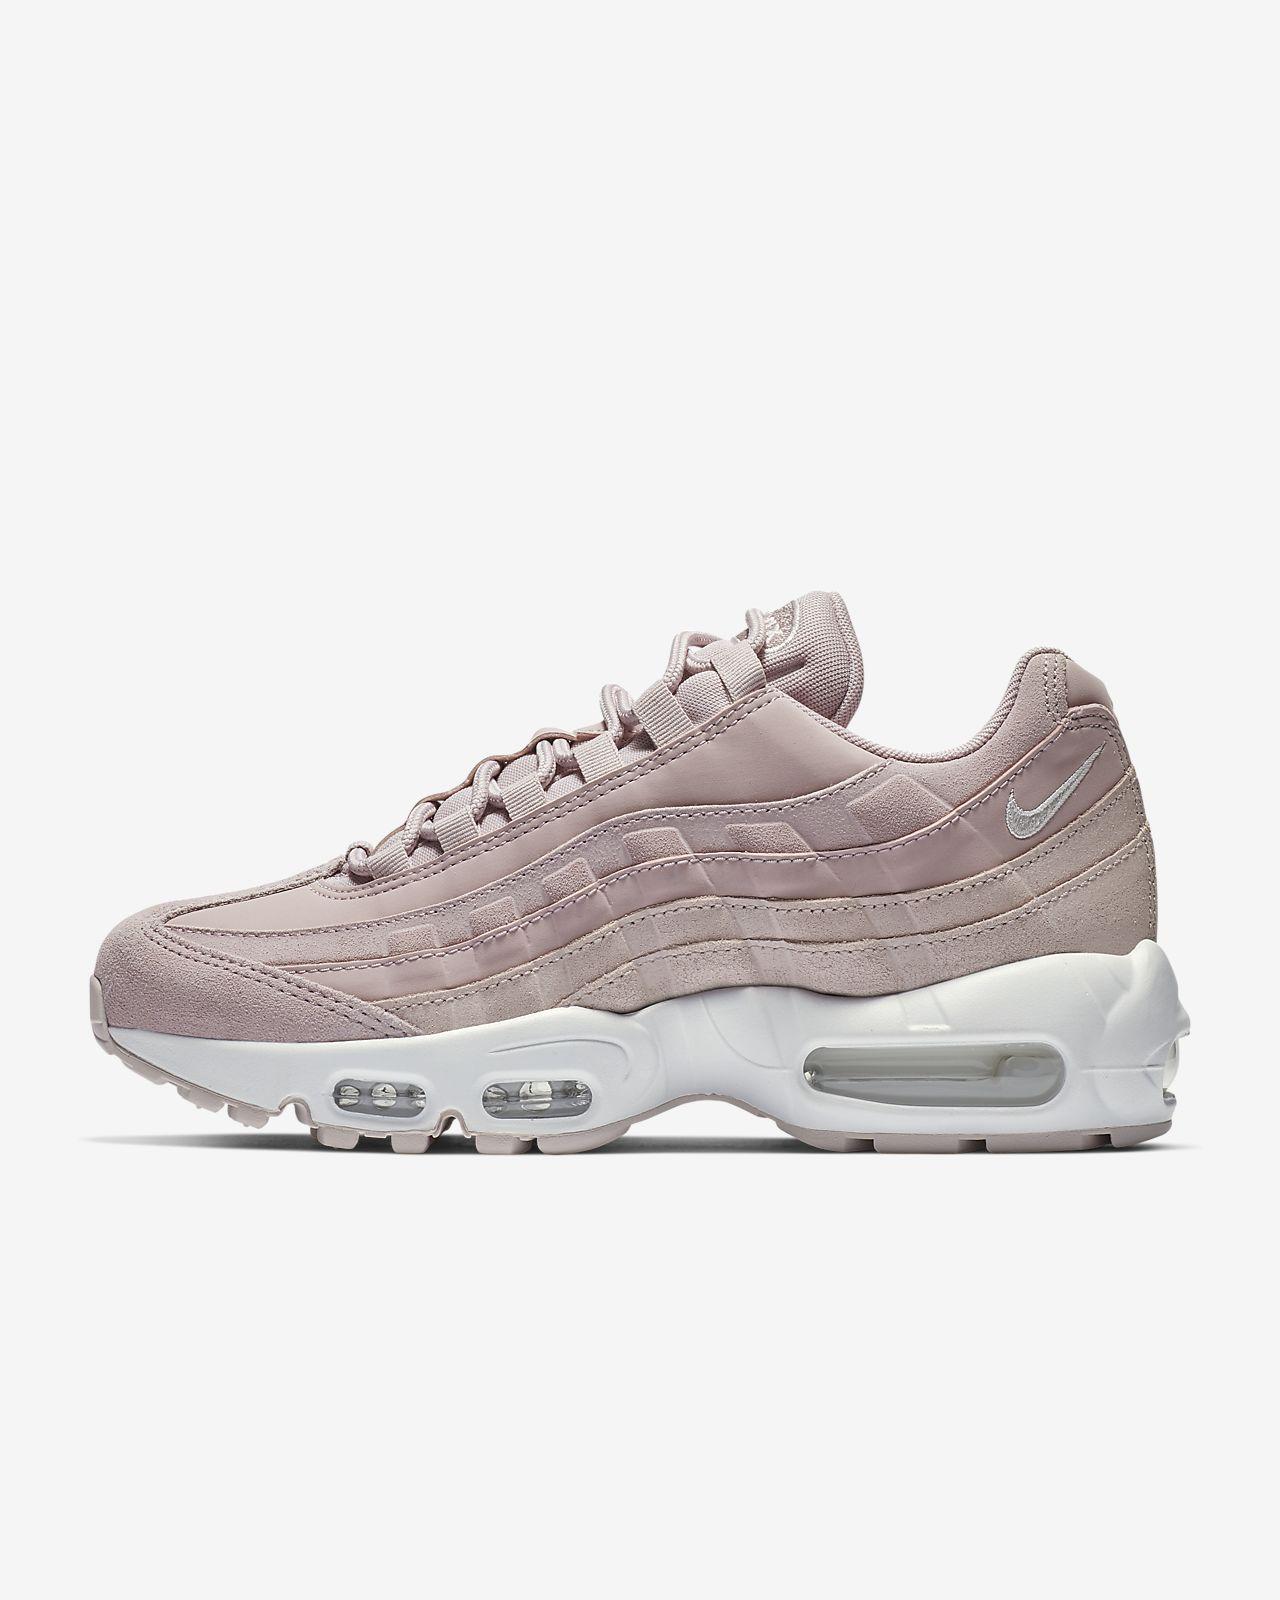 online retailer 45384 44f12 ... Chaussure Nike Air Max 95 Premium pour Femme